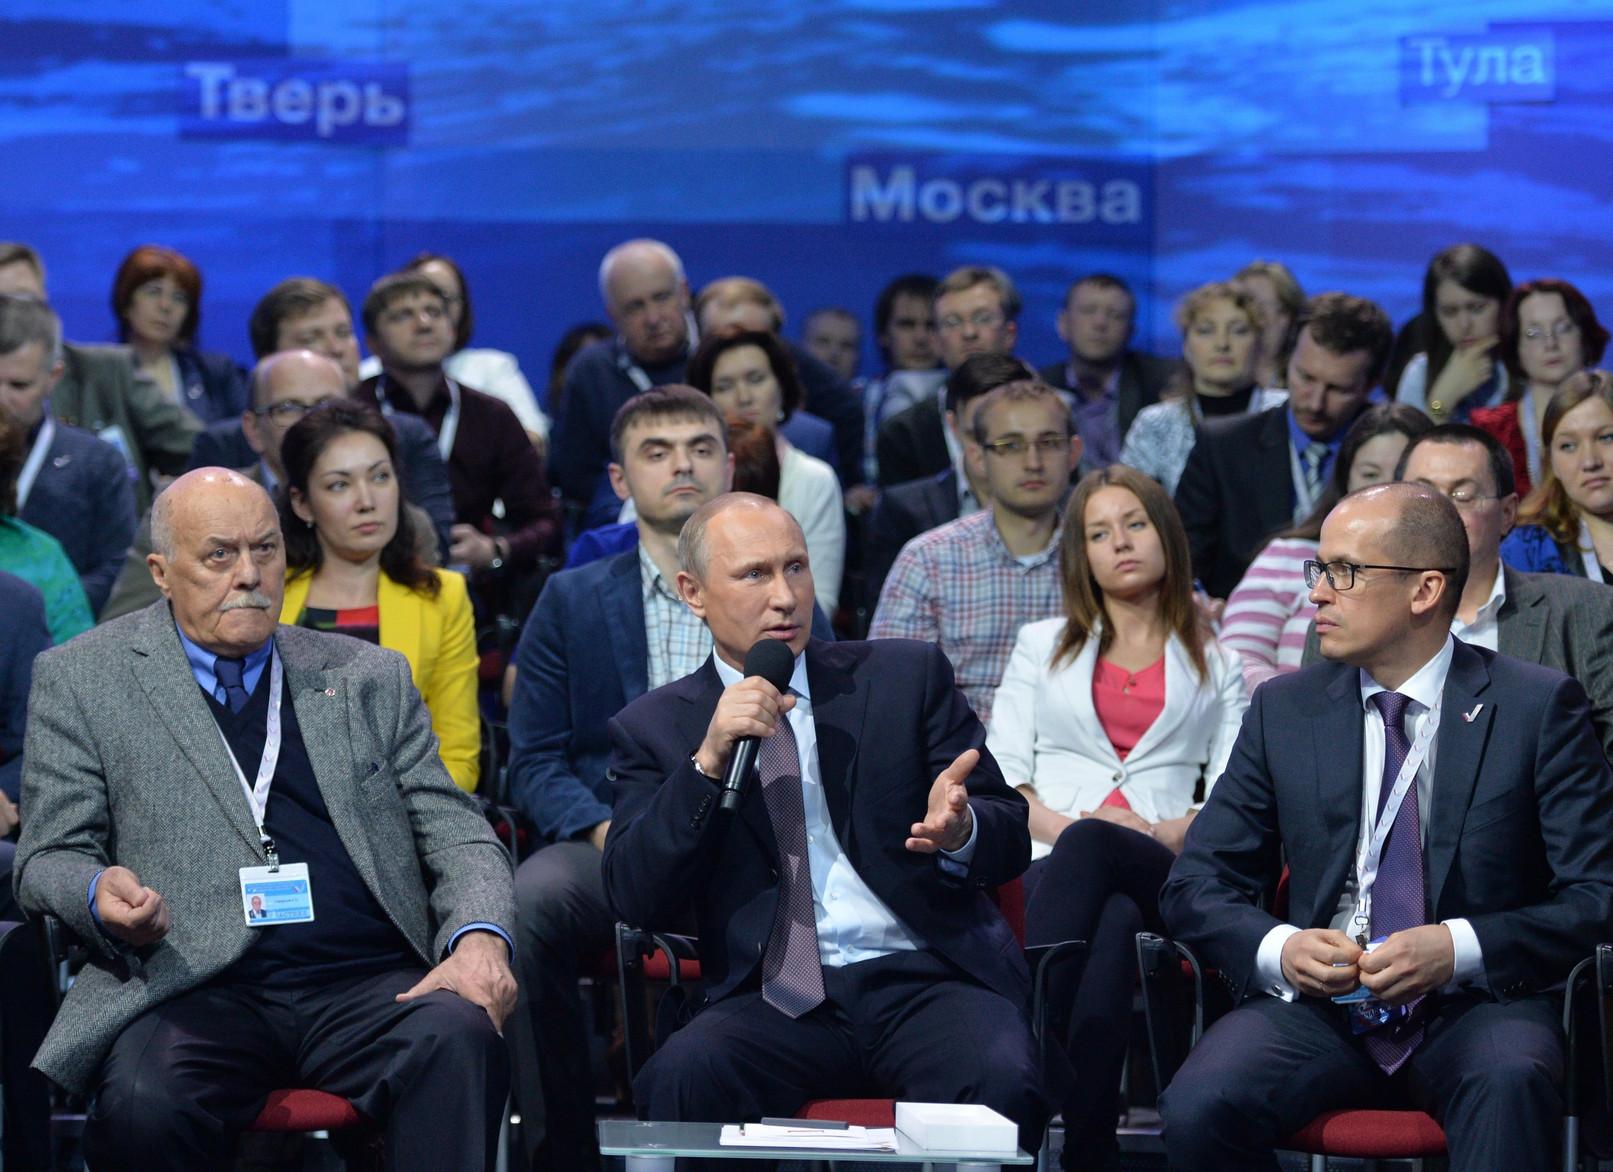 Александр Бречалов на Медиафоруме слушает Путина